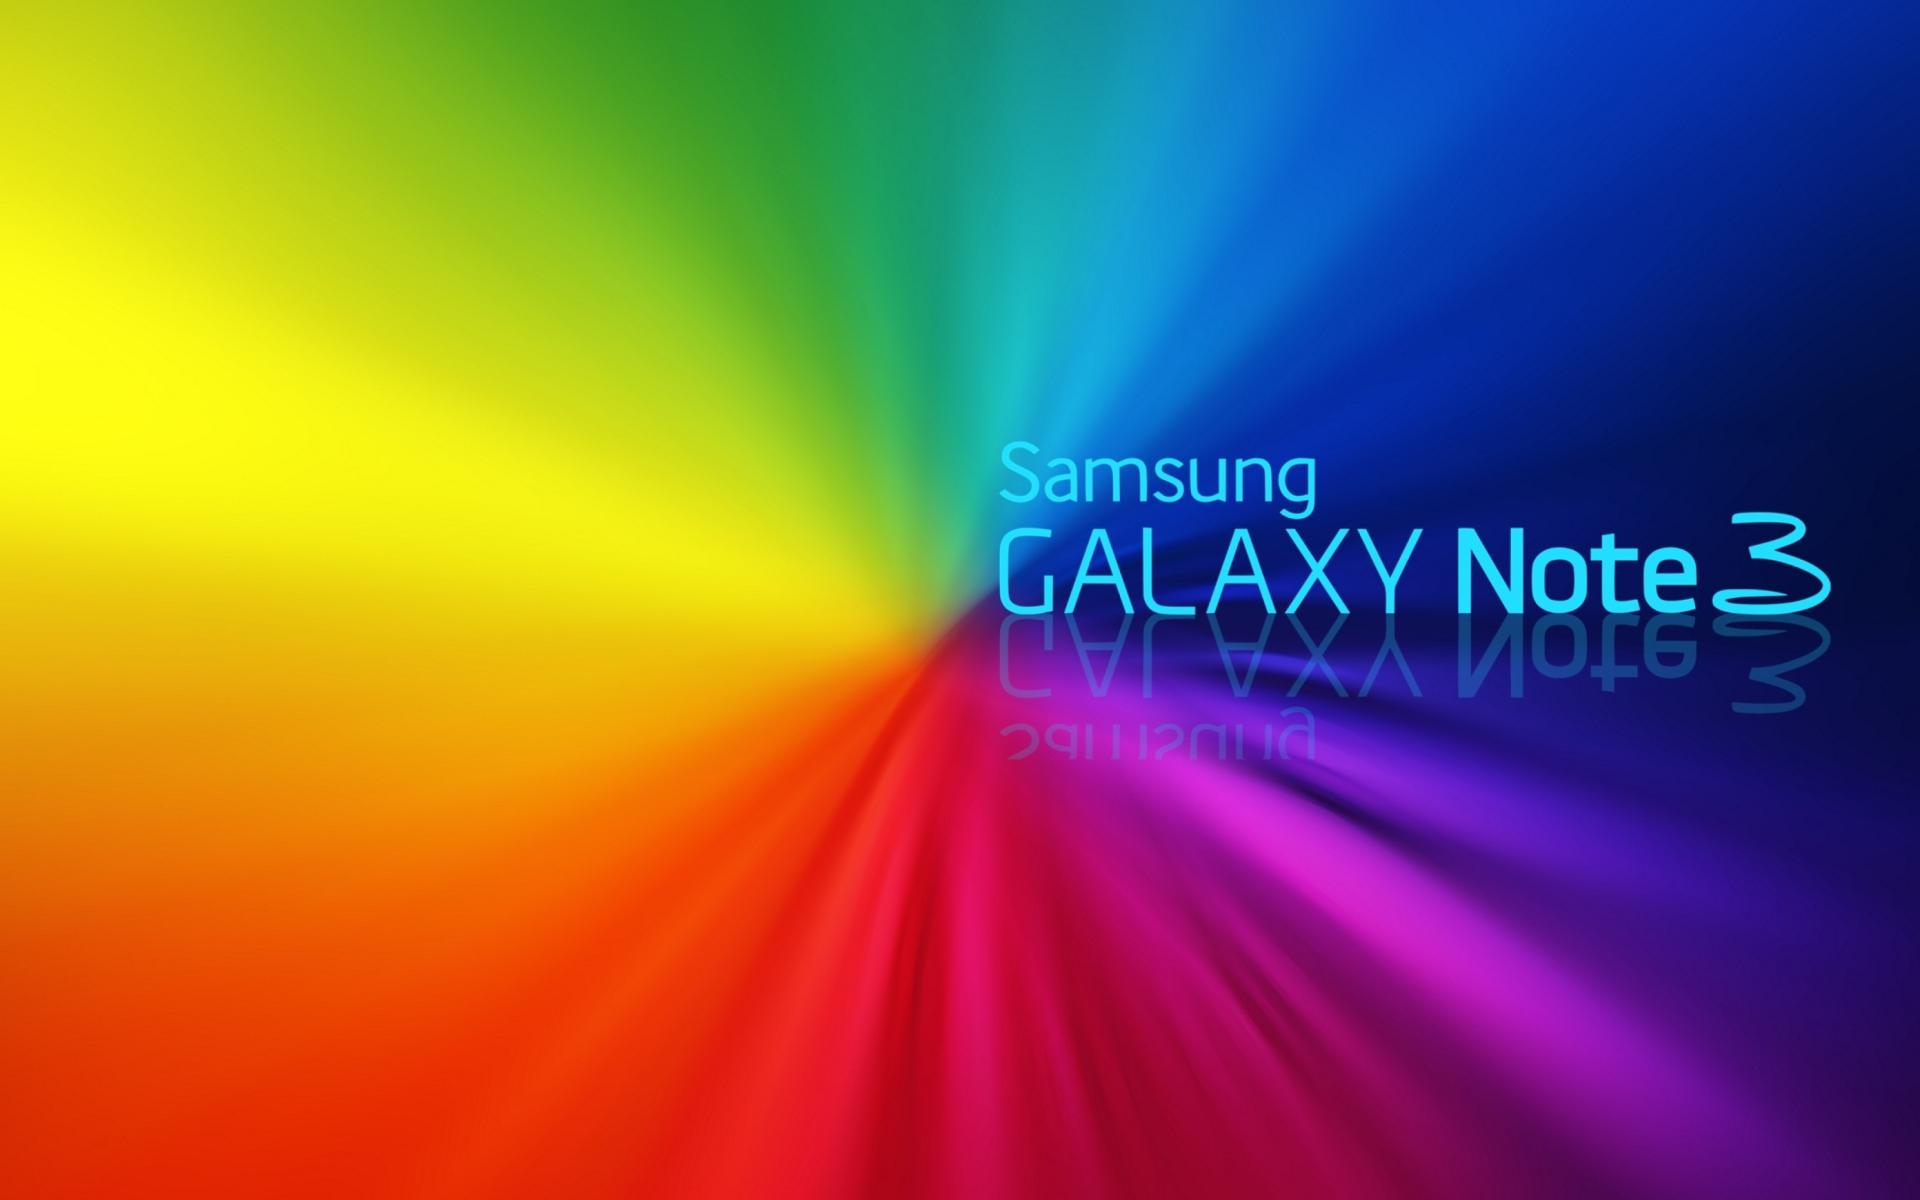 Samsung Galaxy Note 10 Wallpaper For Widescreen Desktop Pc: Kostenloses Samsung Galaxy Note 3 Wallpaper Für Widescreen